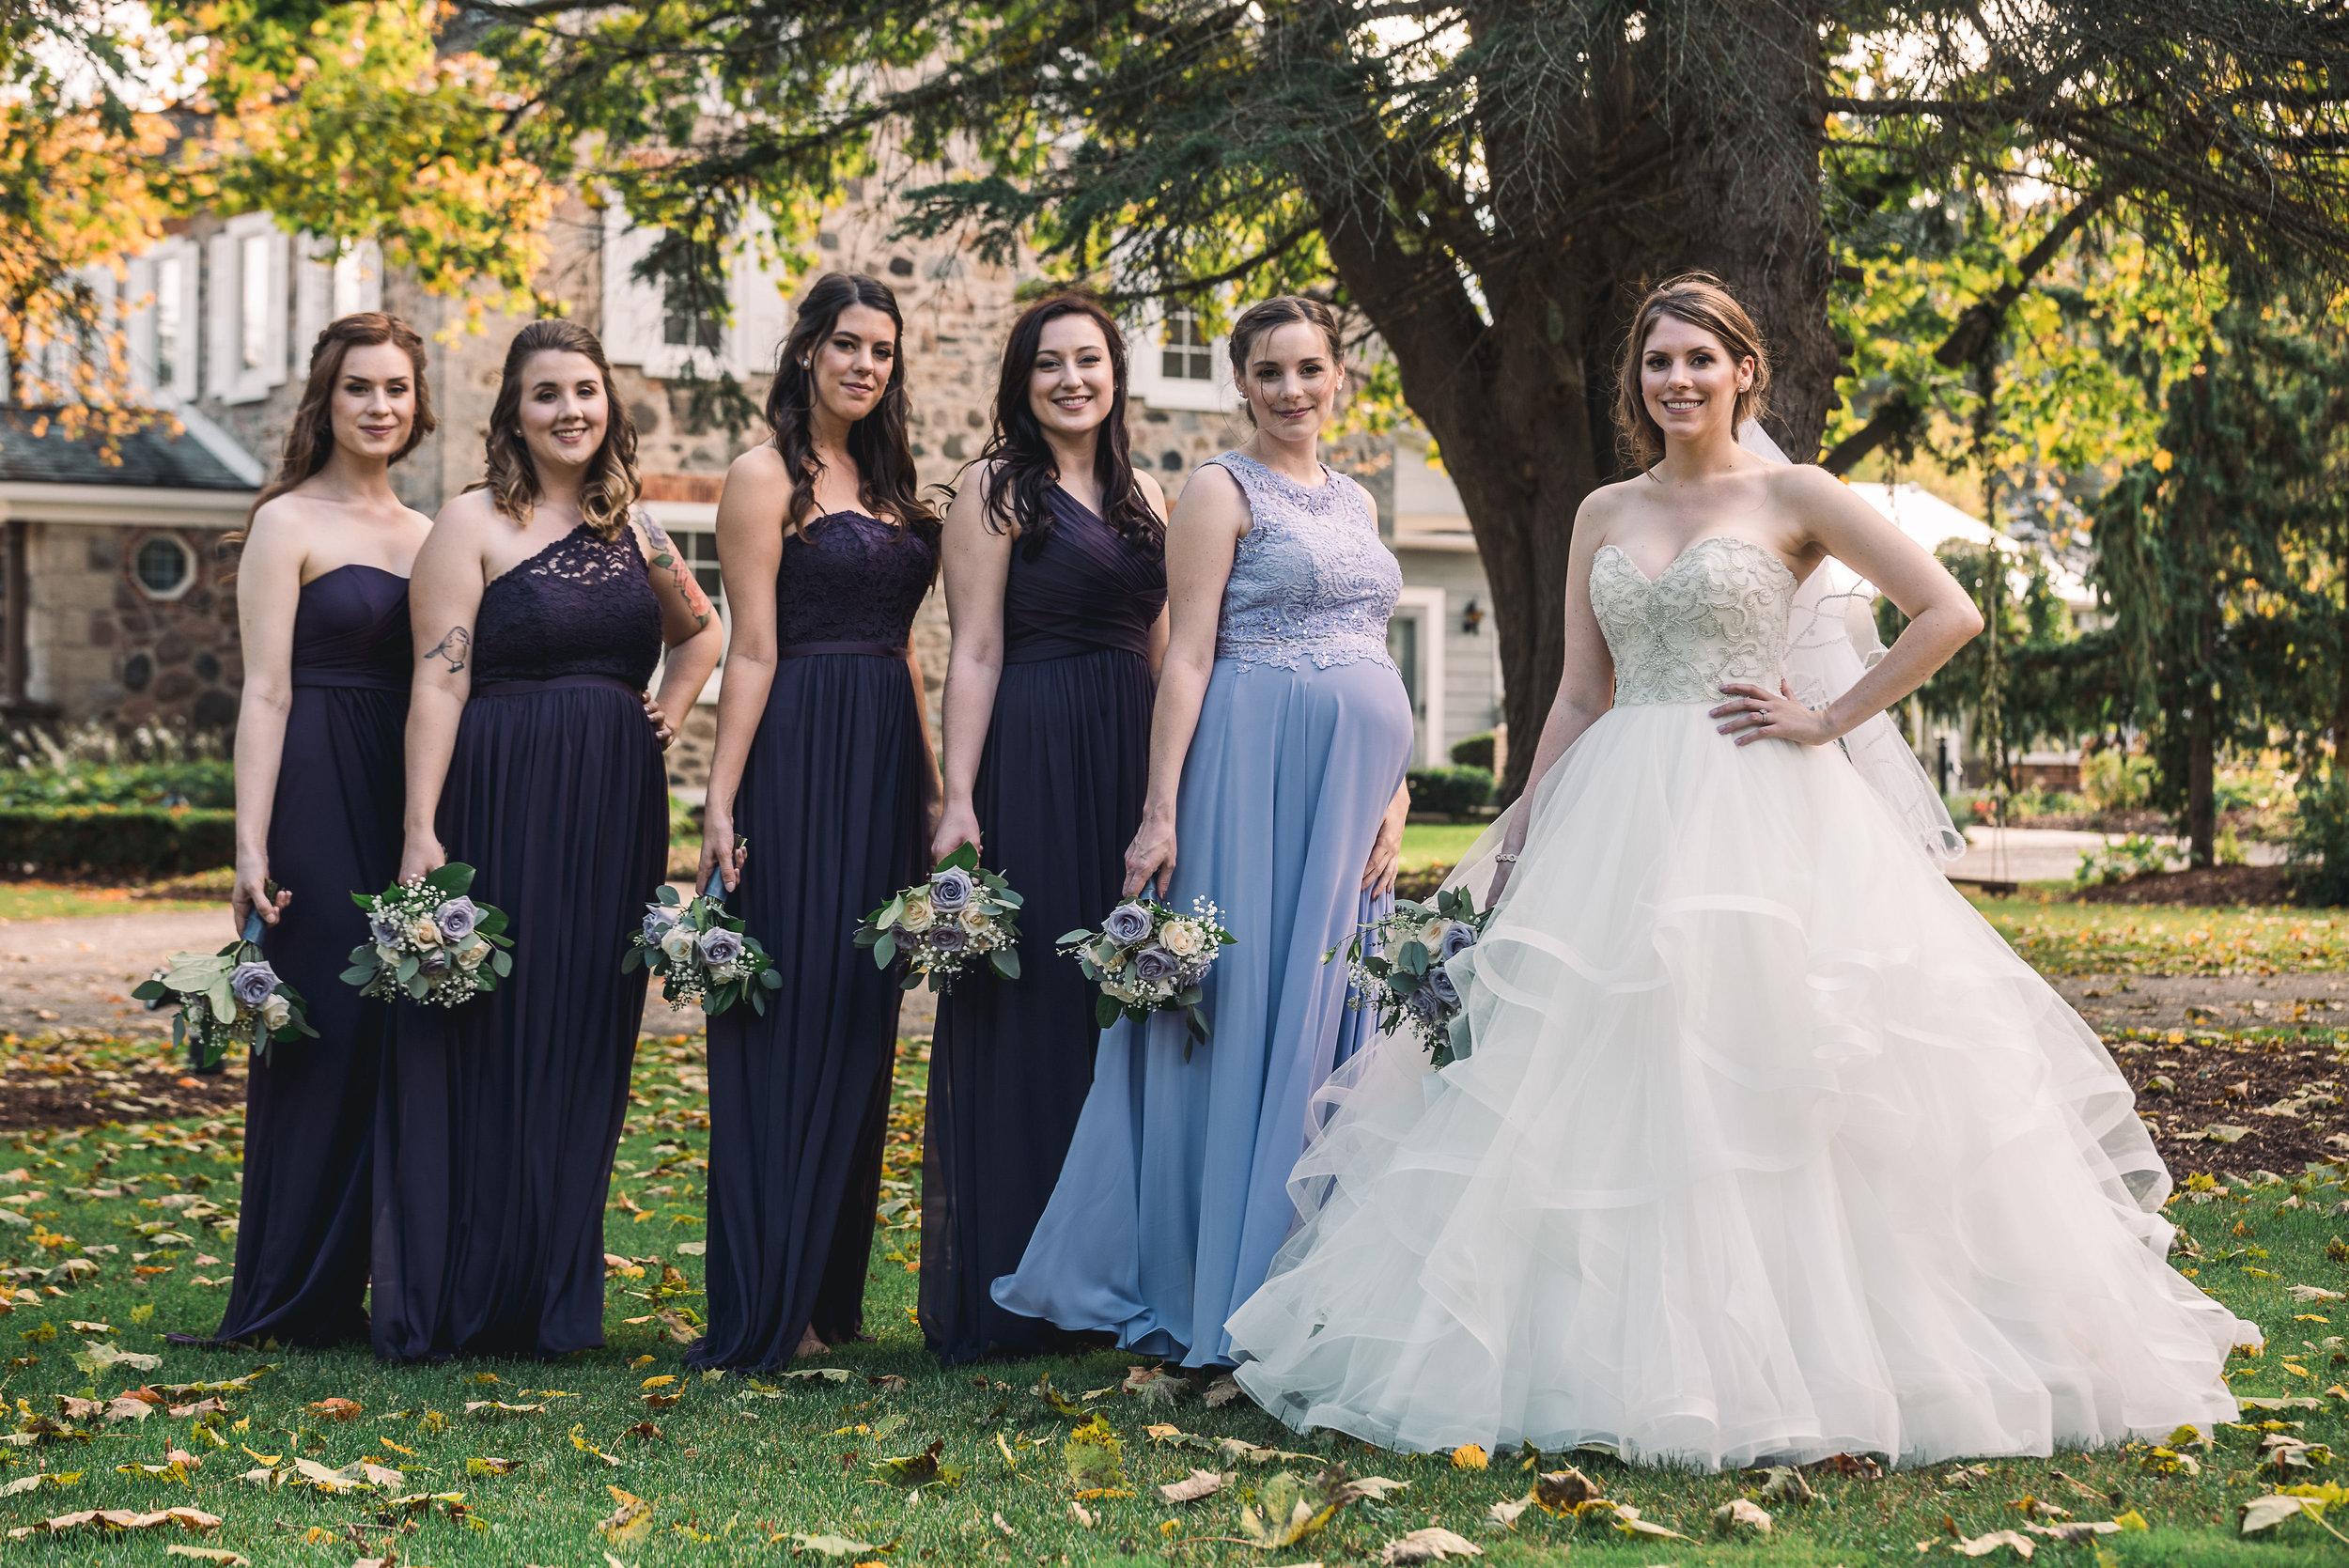 David & Kara Wedding Imagery